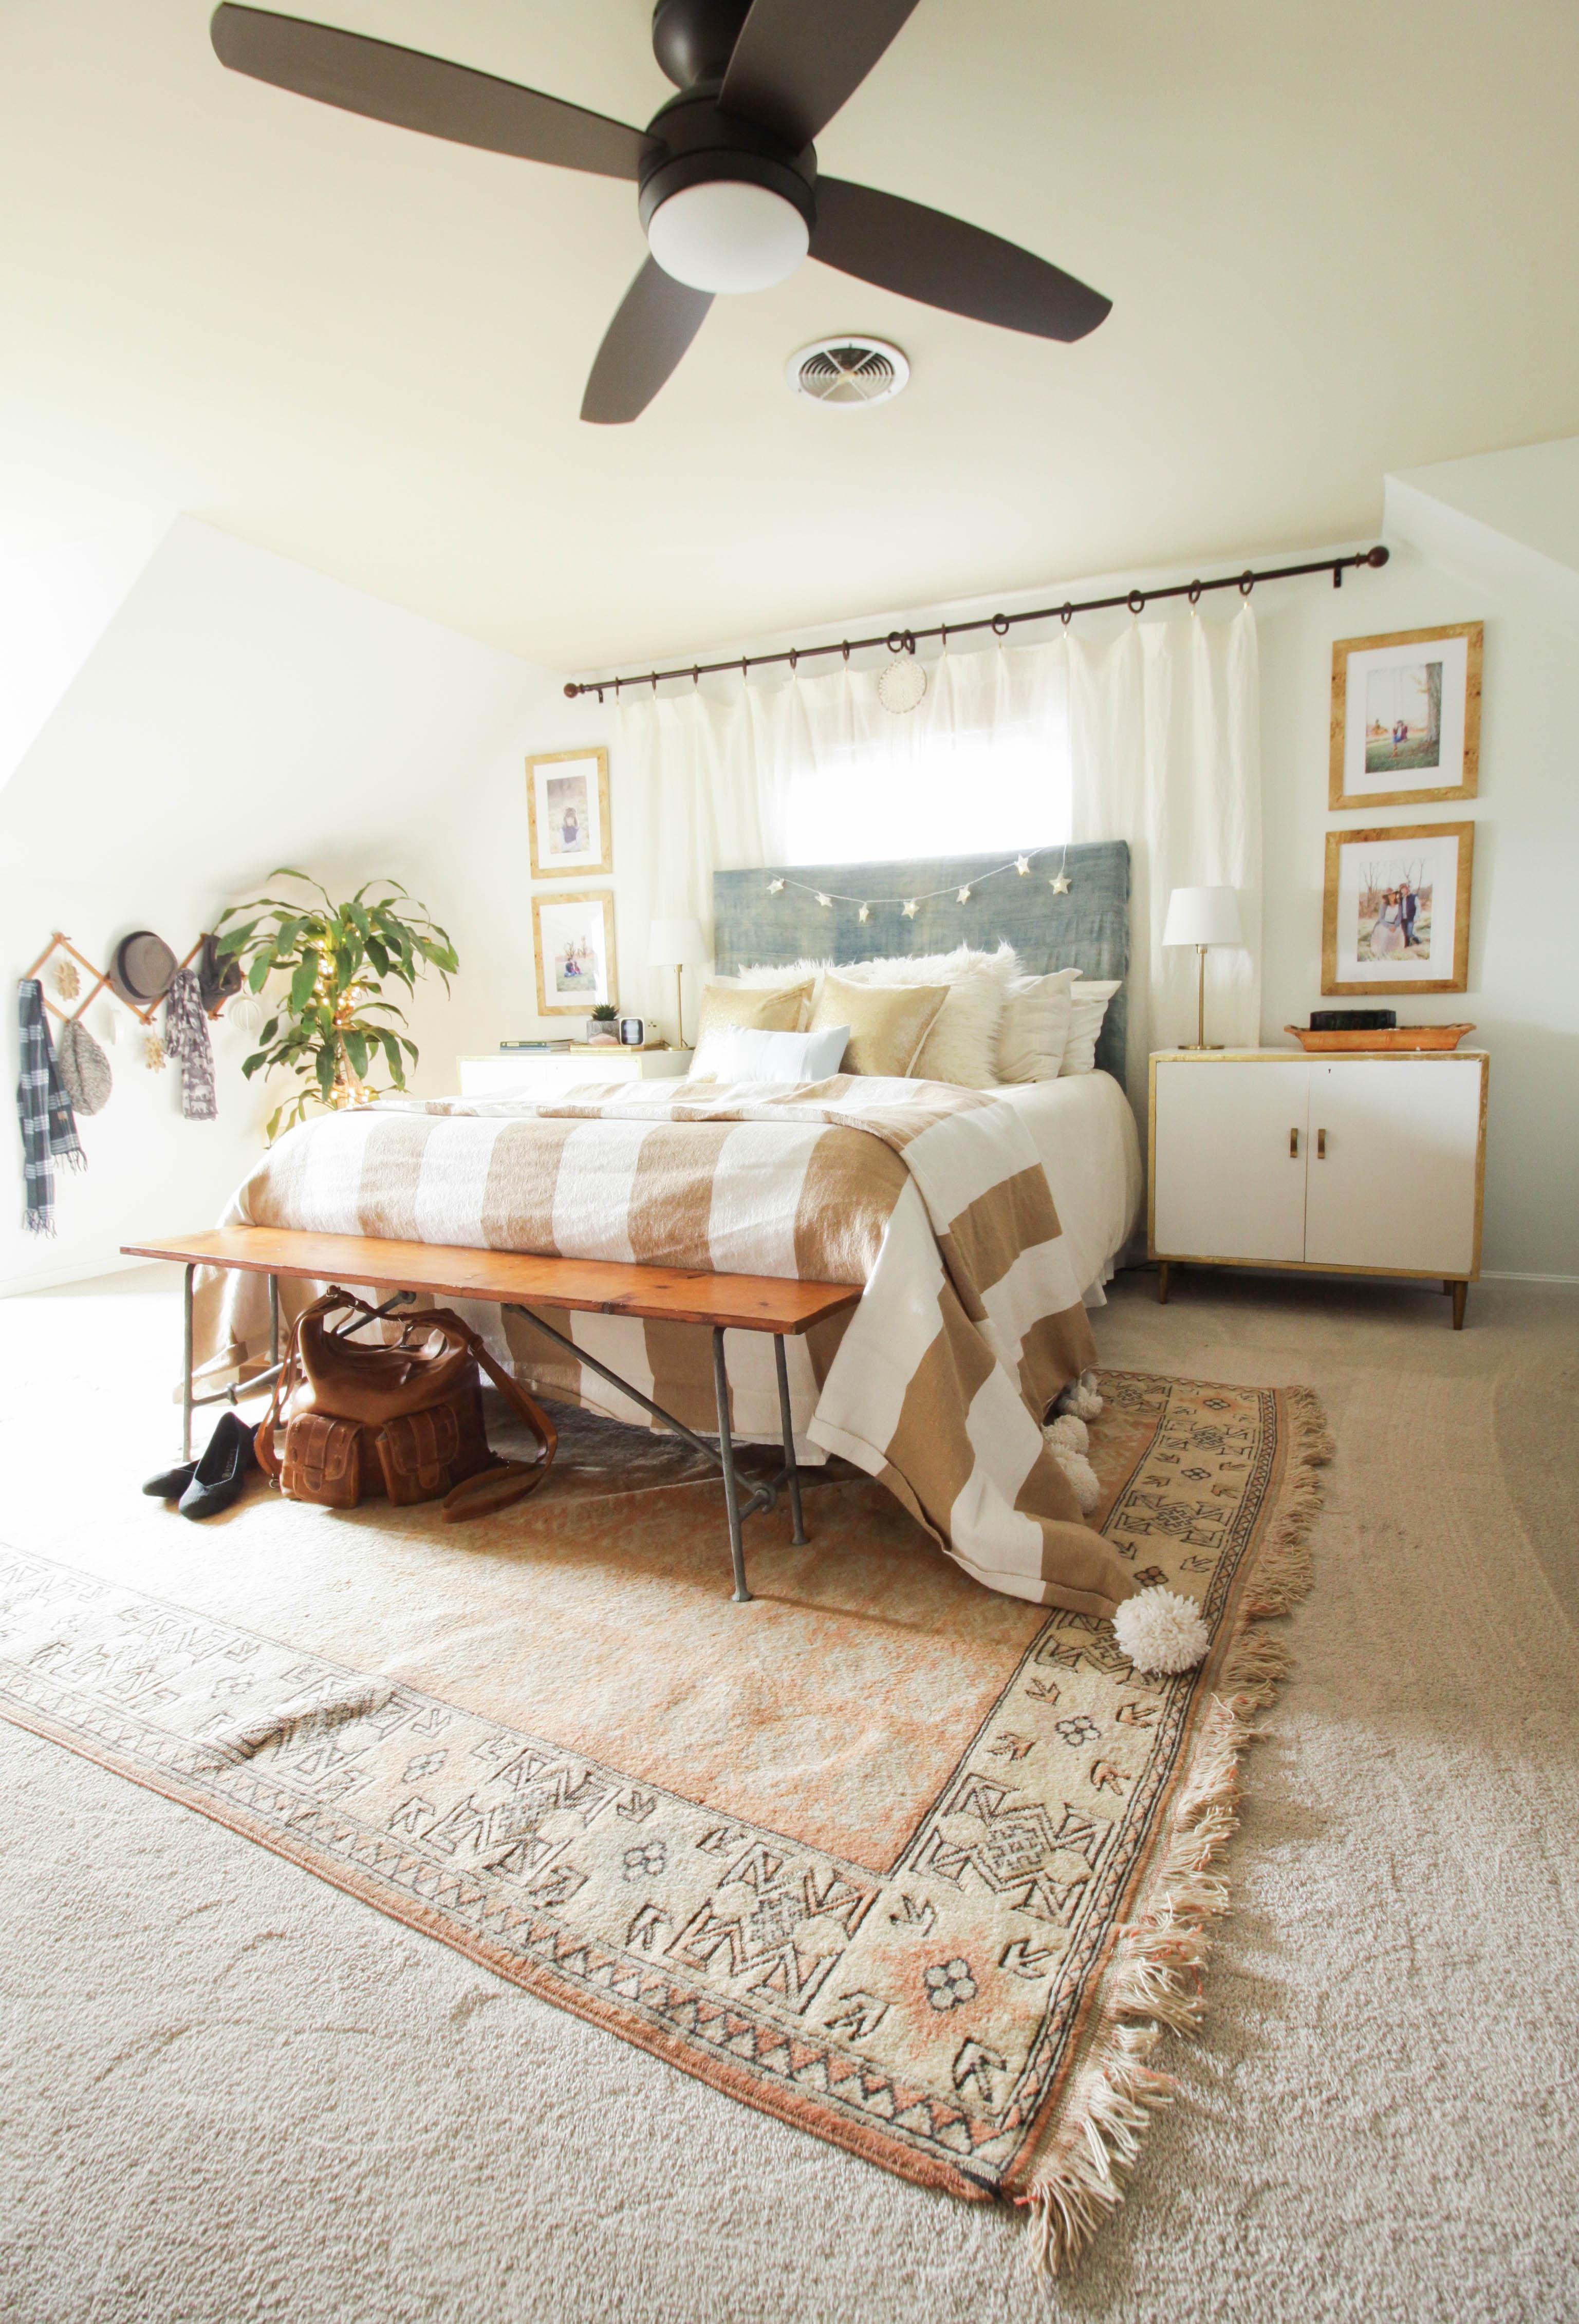 Modern Bohemian Christmas Bedroom Eclectic Christmas Home